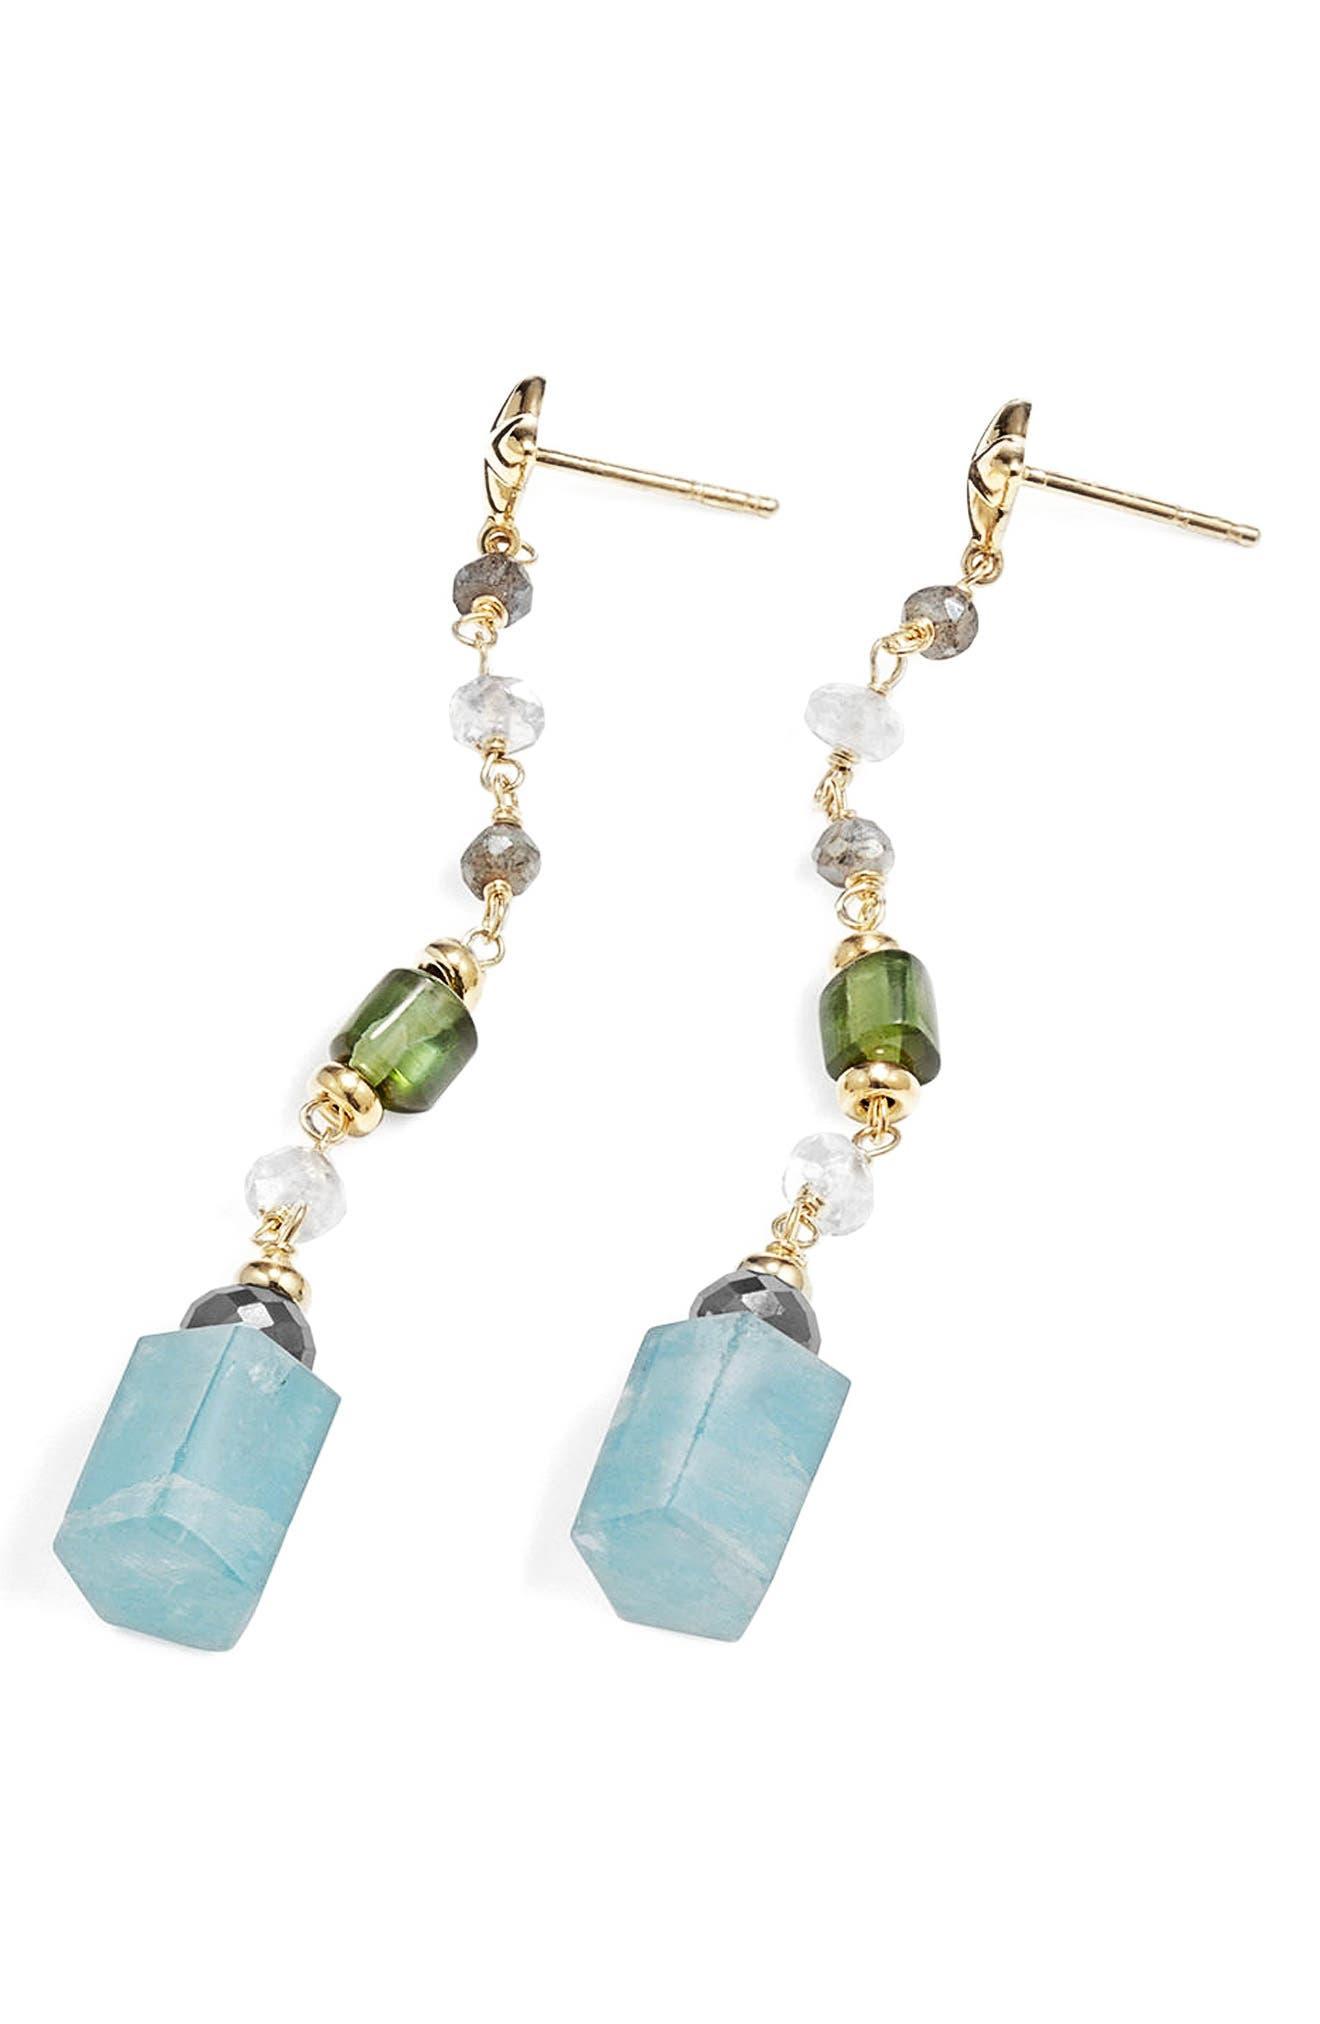 Bead & Chain Earrings with Semiprecious Stones,                             Alternate thumbnail 2, color,                             Aquamarine